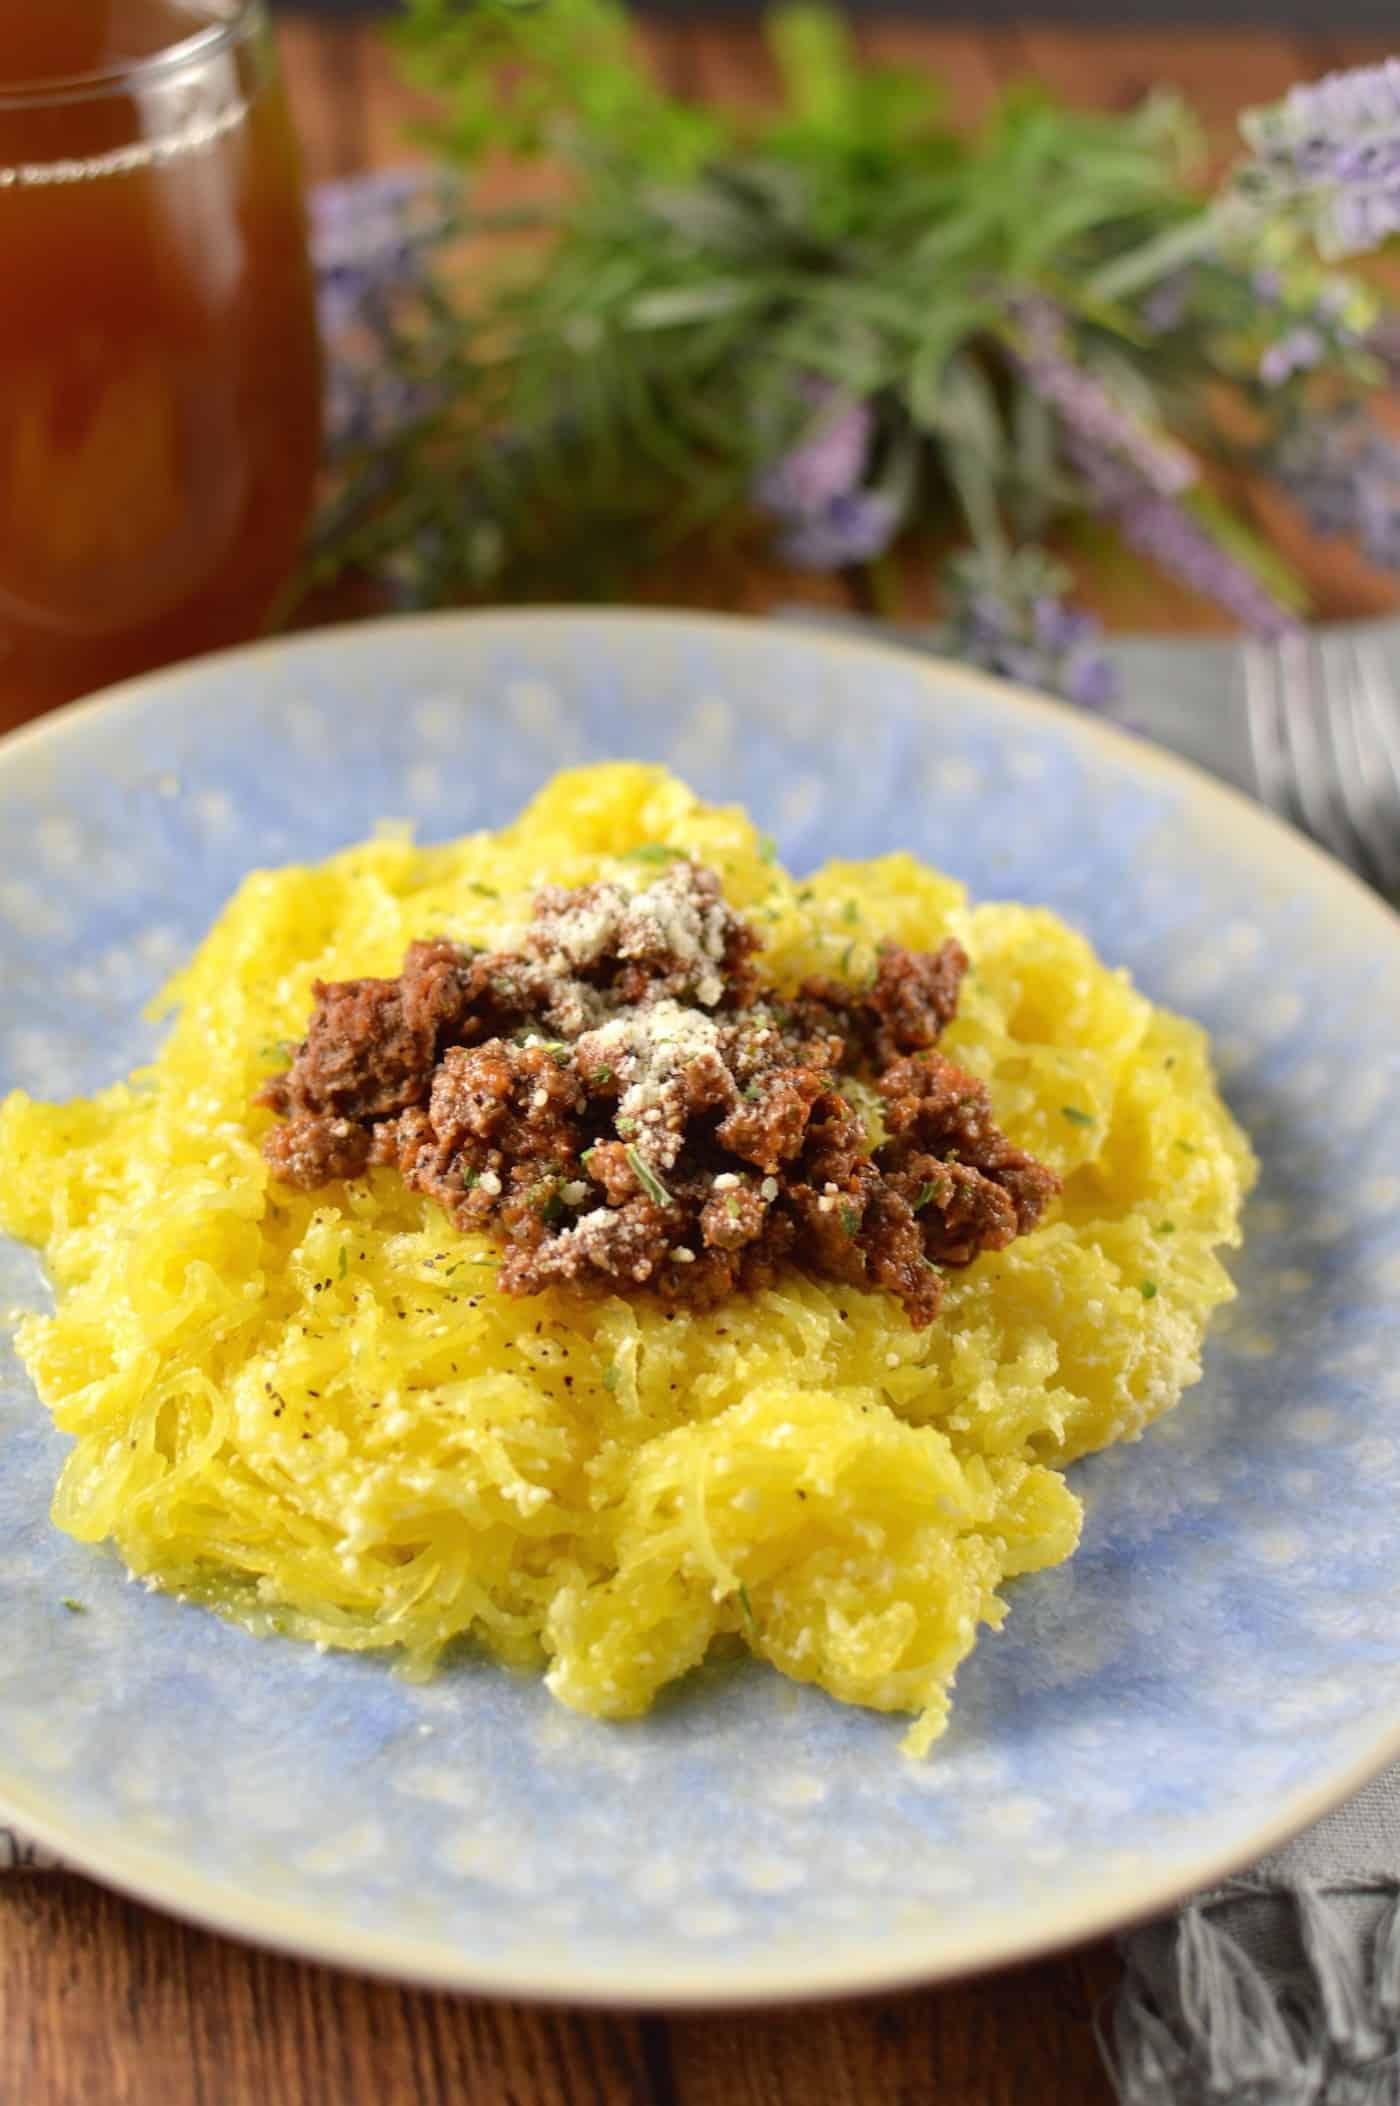 instant pot spaghetti using spaghetti squash